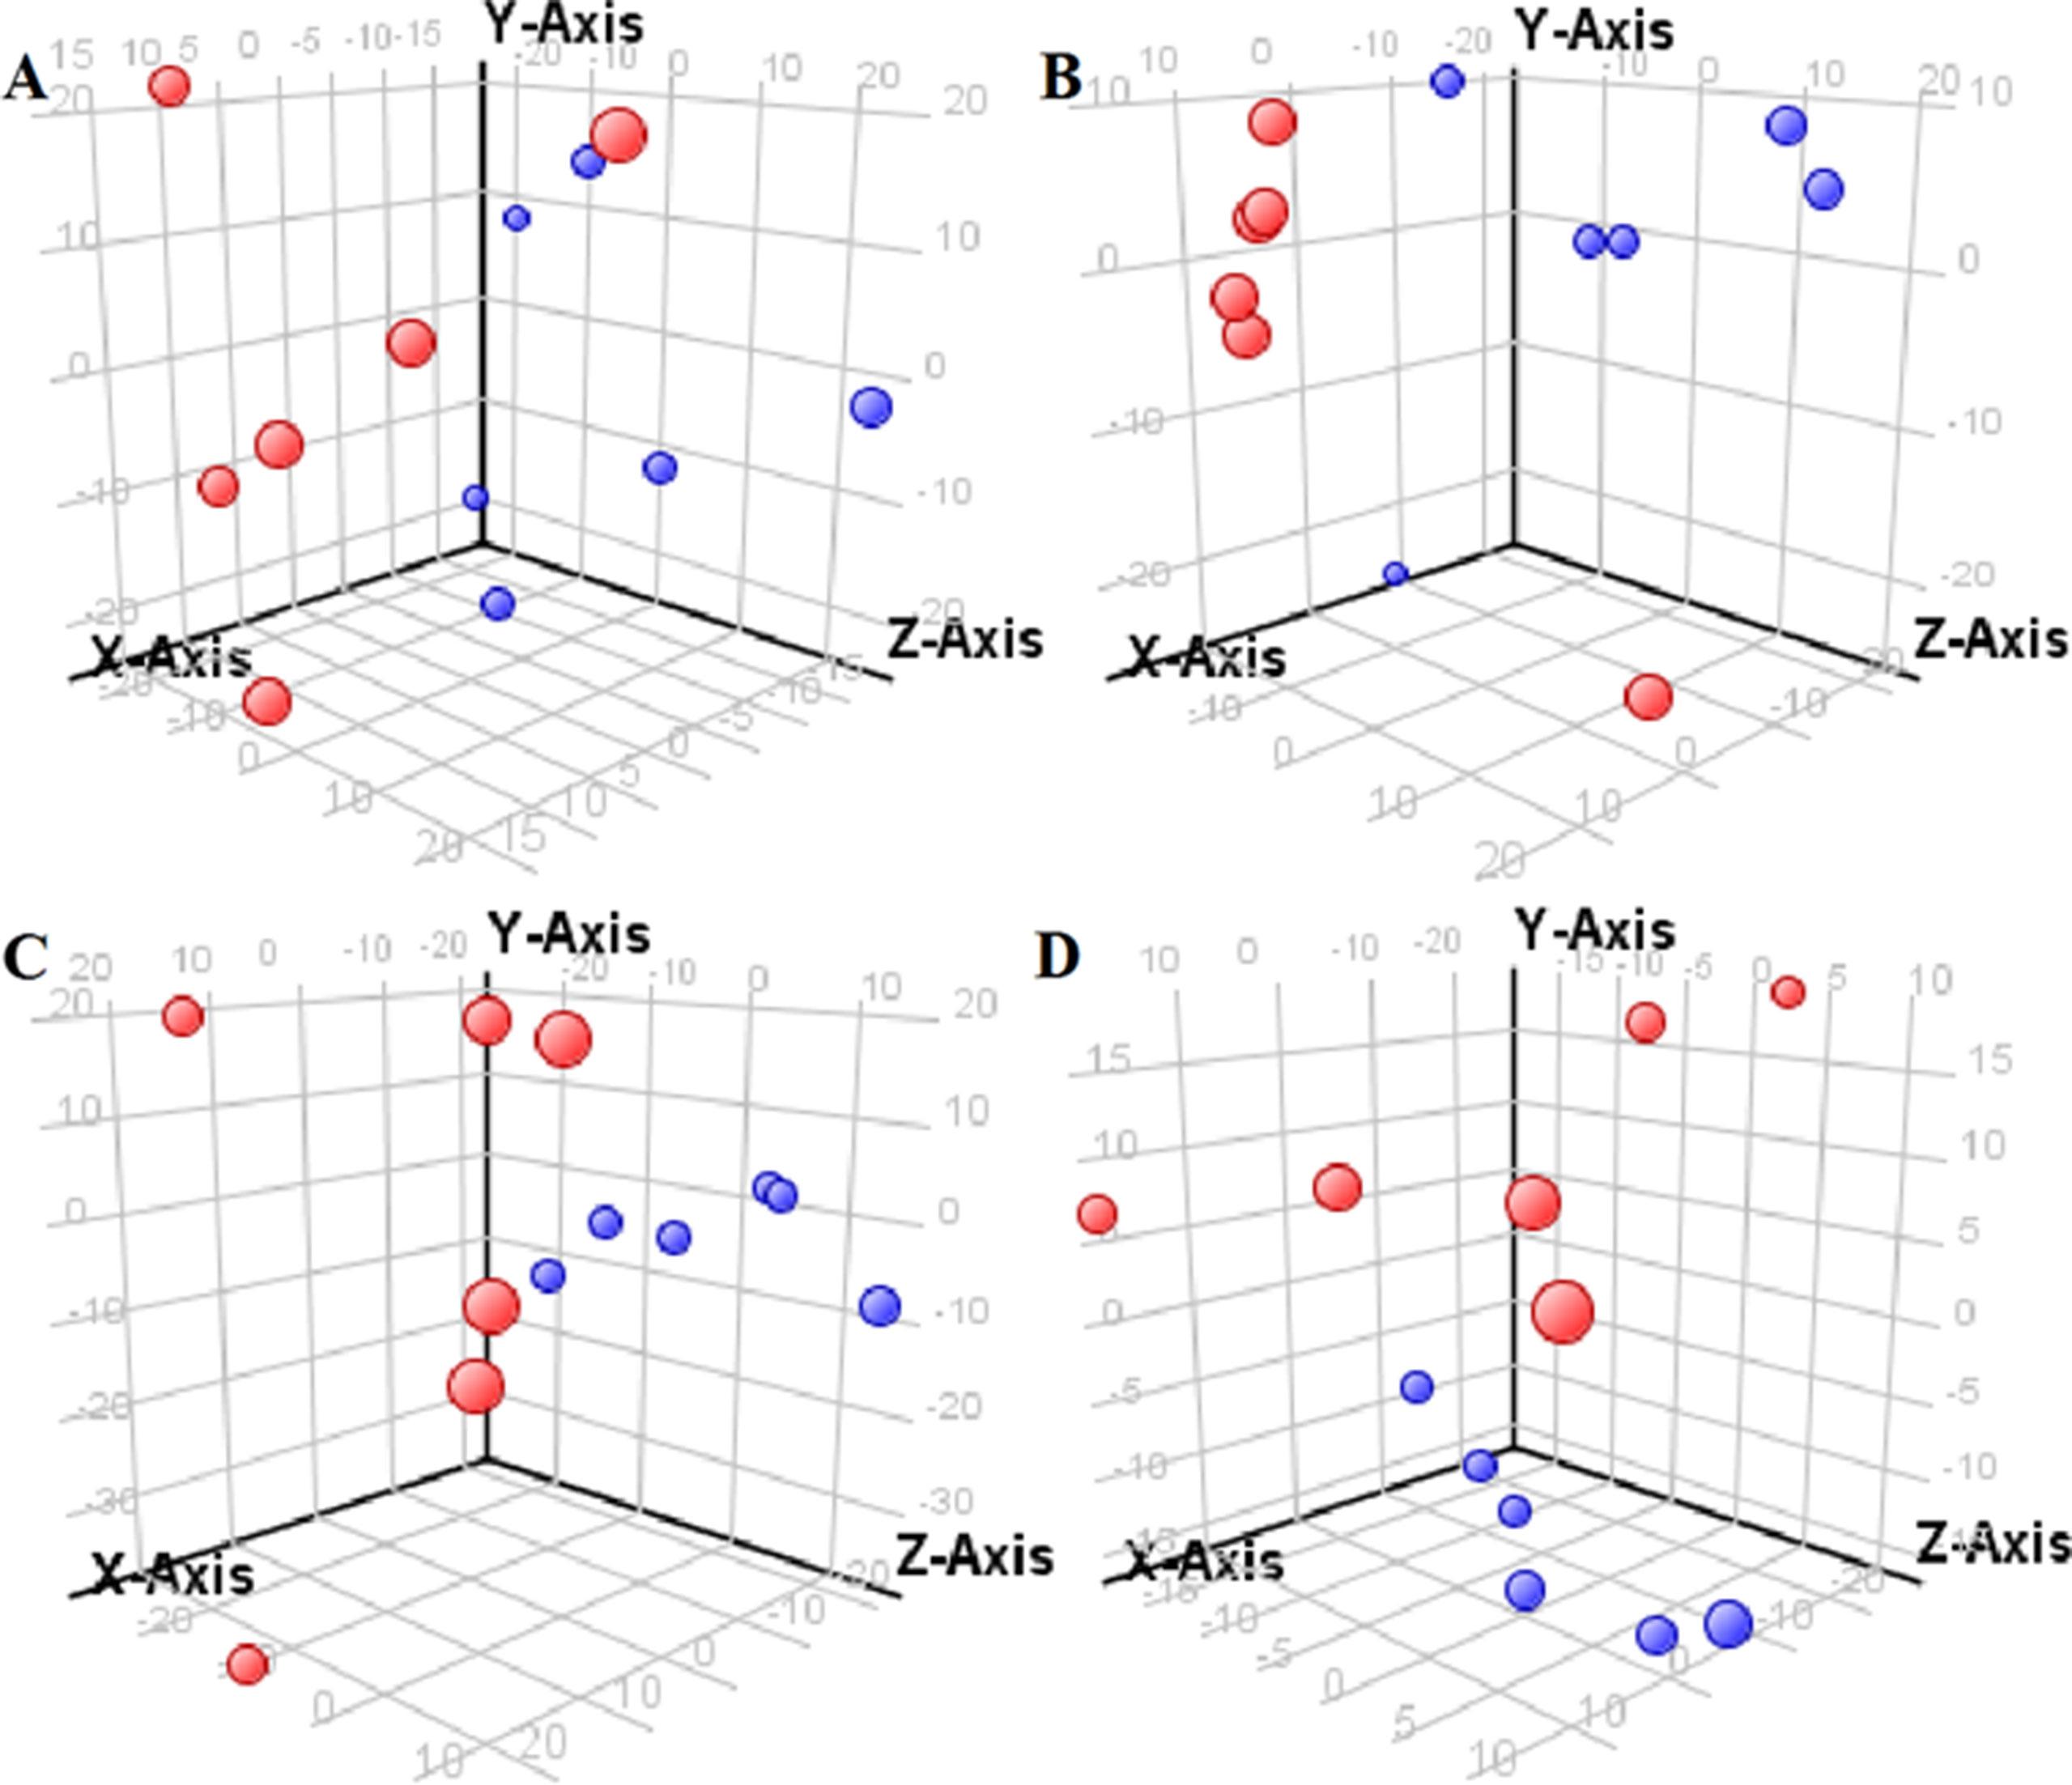 Frontiers   Metabolomics Study of Metabolic Changes in Renal